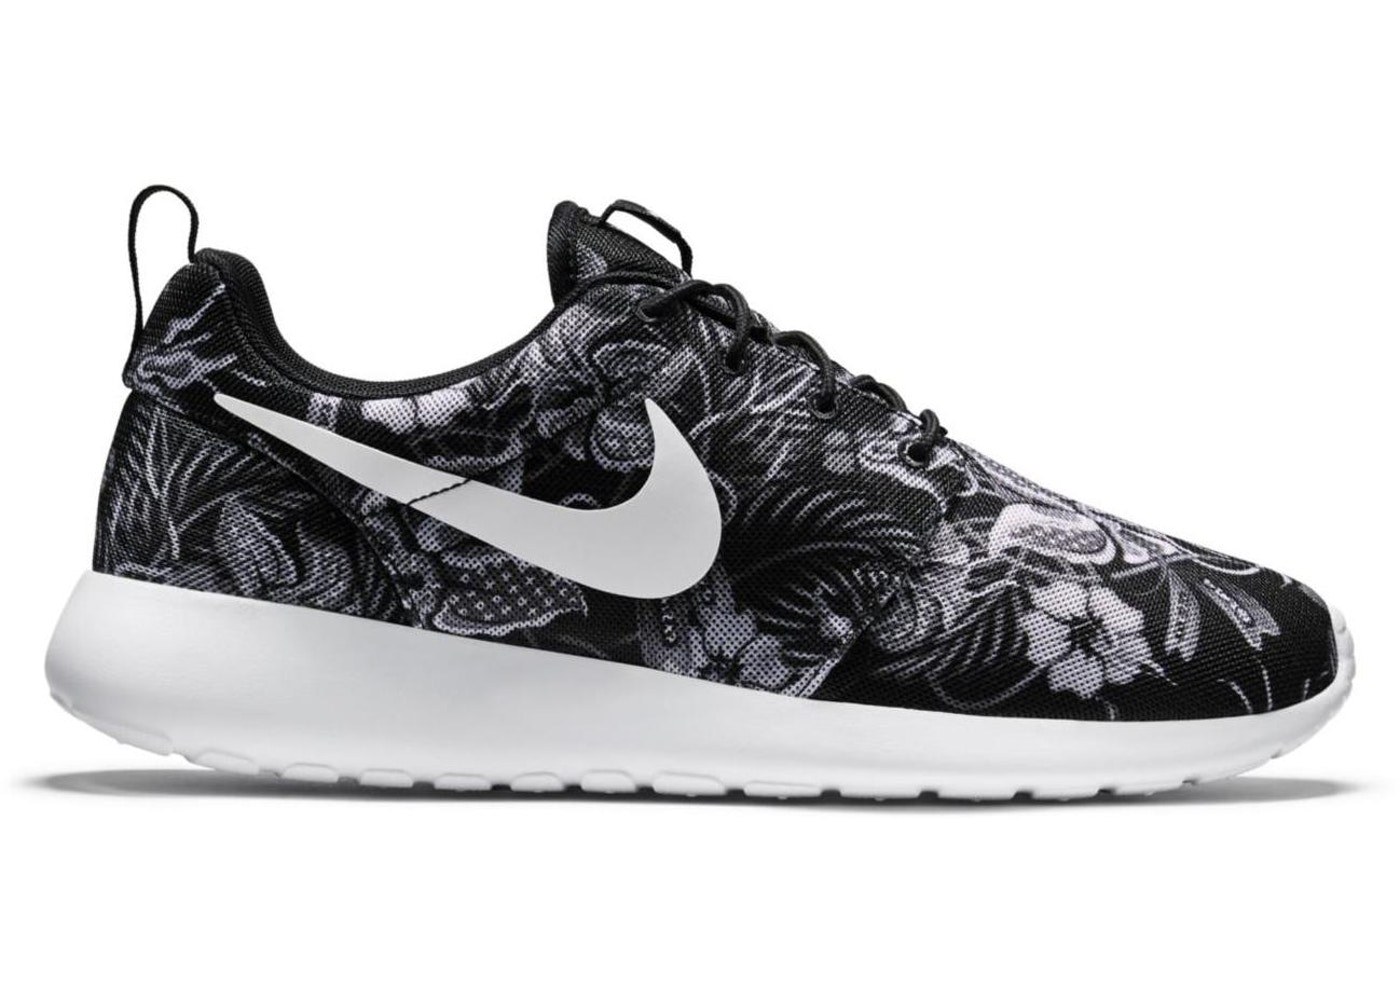 new concept d9266 a023f Nike Roshe Run Floral Print Black - 655206-018